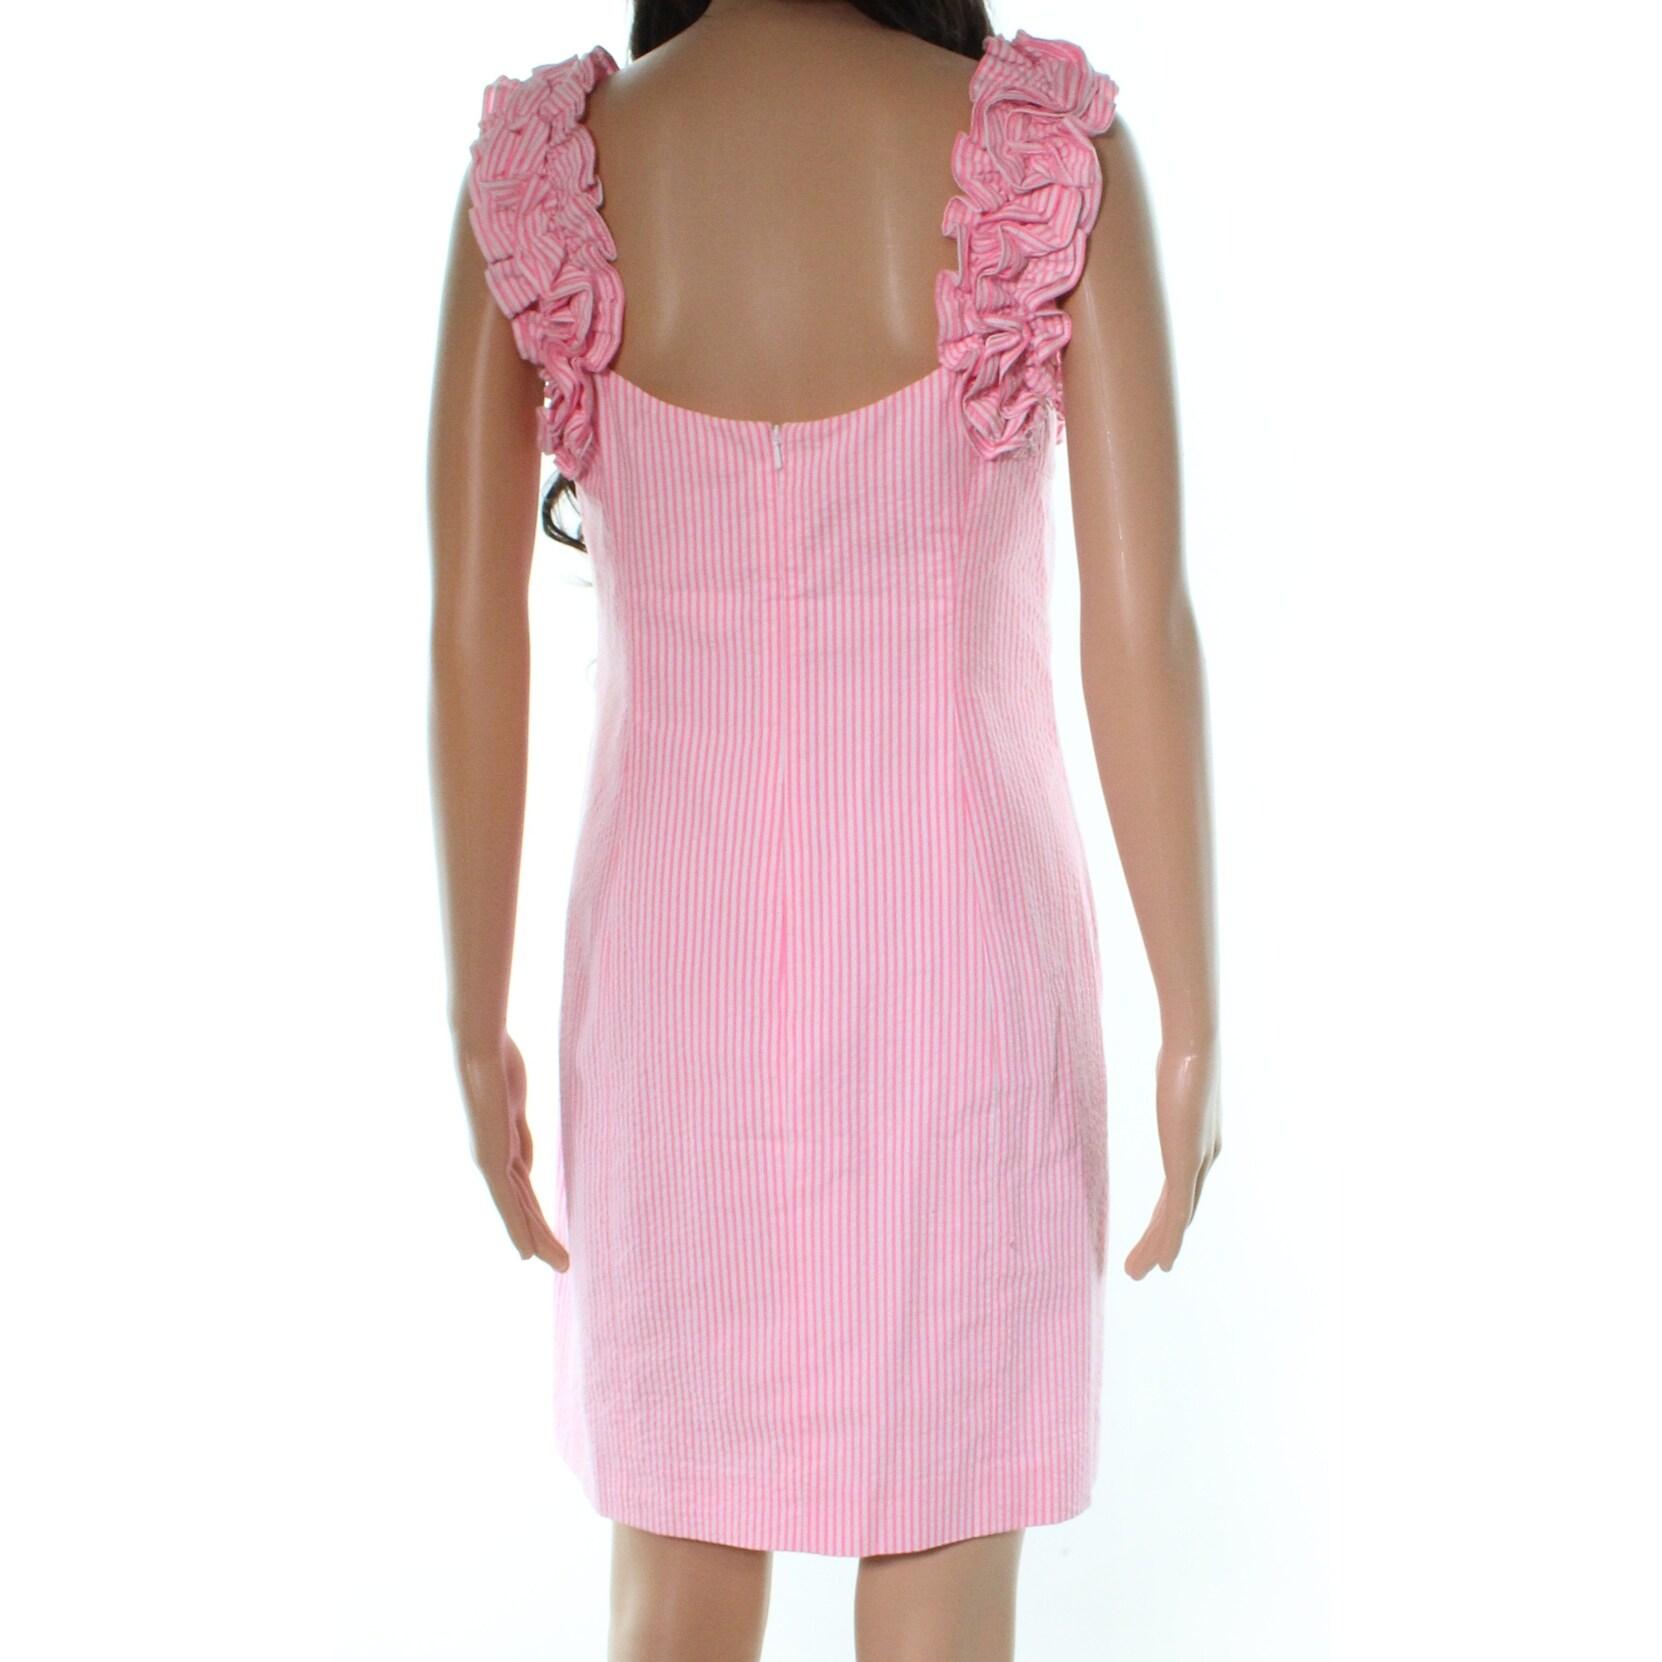 Shop Lilly Pulitzer Pink Seersucker Rosette Women S Size 4 Sheath